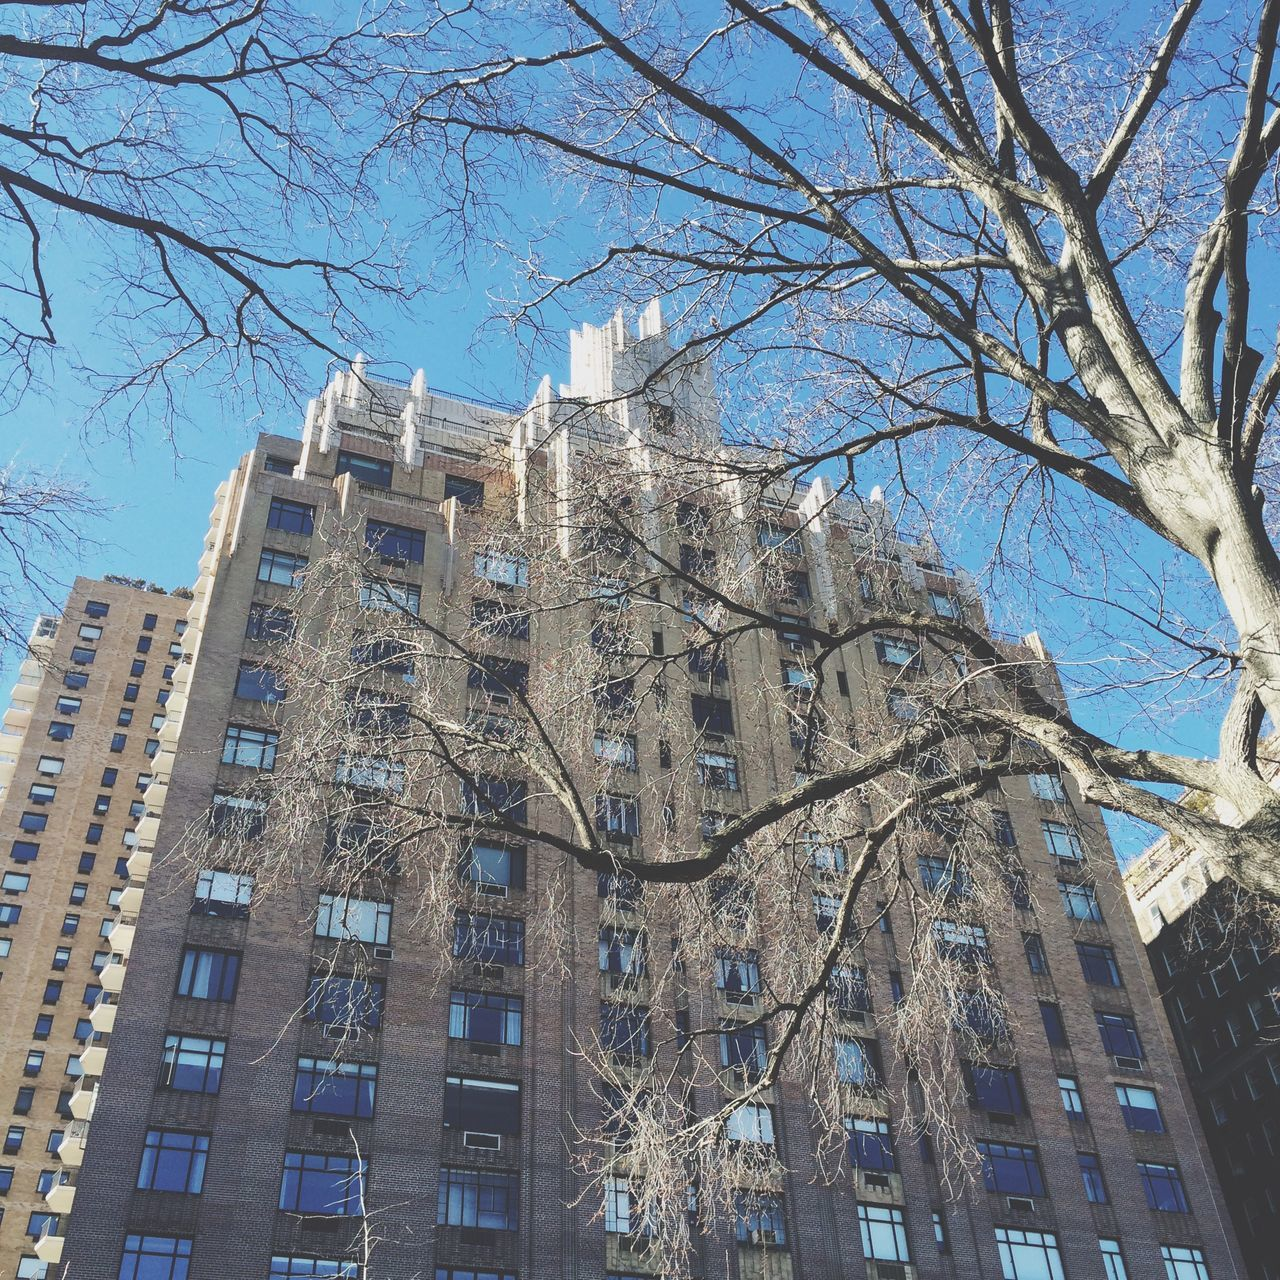 NYC Manhattan Building TallBuilding Brightbuilding Sunny Building UWS Upperwestside Tall Tree Sandybuilding Blue Sky Many Windows Skyscraper